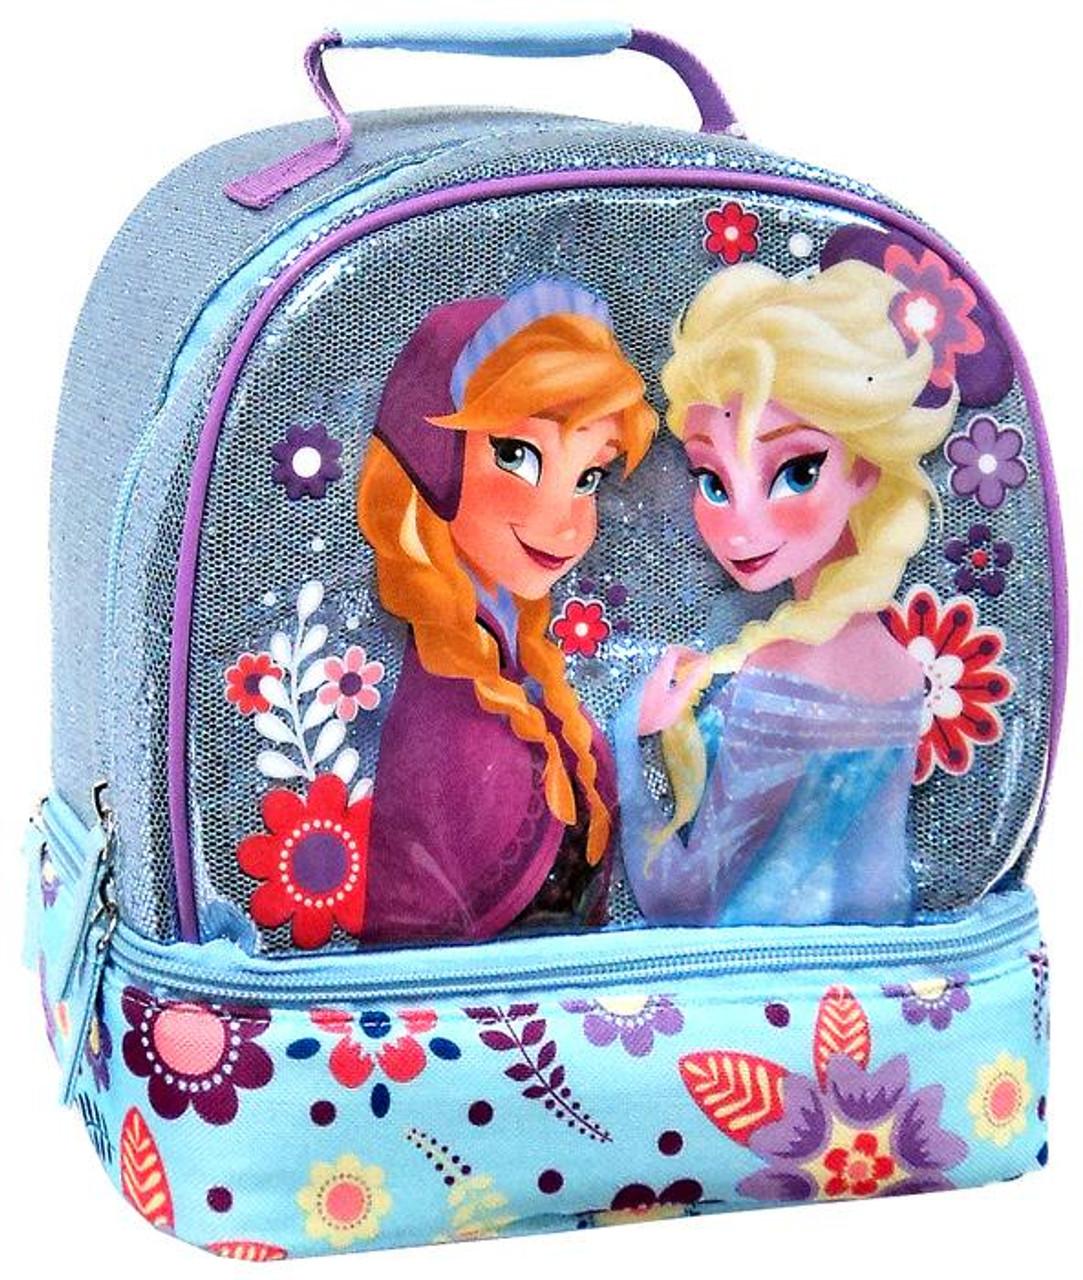 ce0919fe329c Disney Frozen Anna Elsa Tote Bag Exclusive Lunch Box - ToyWiz